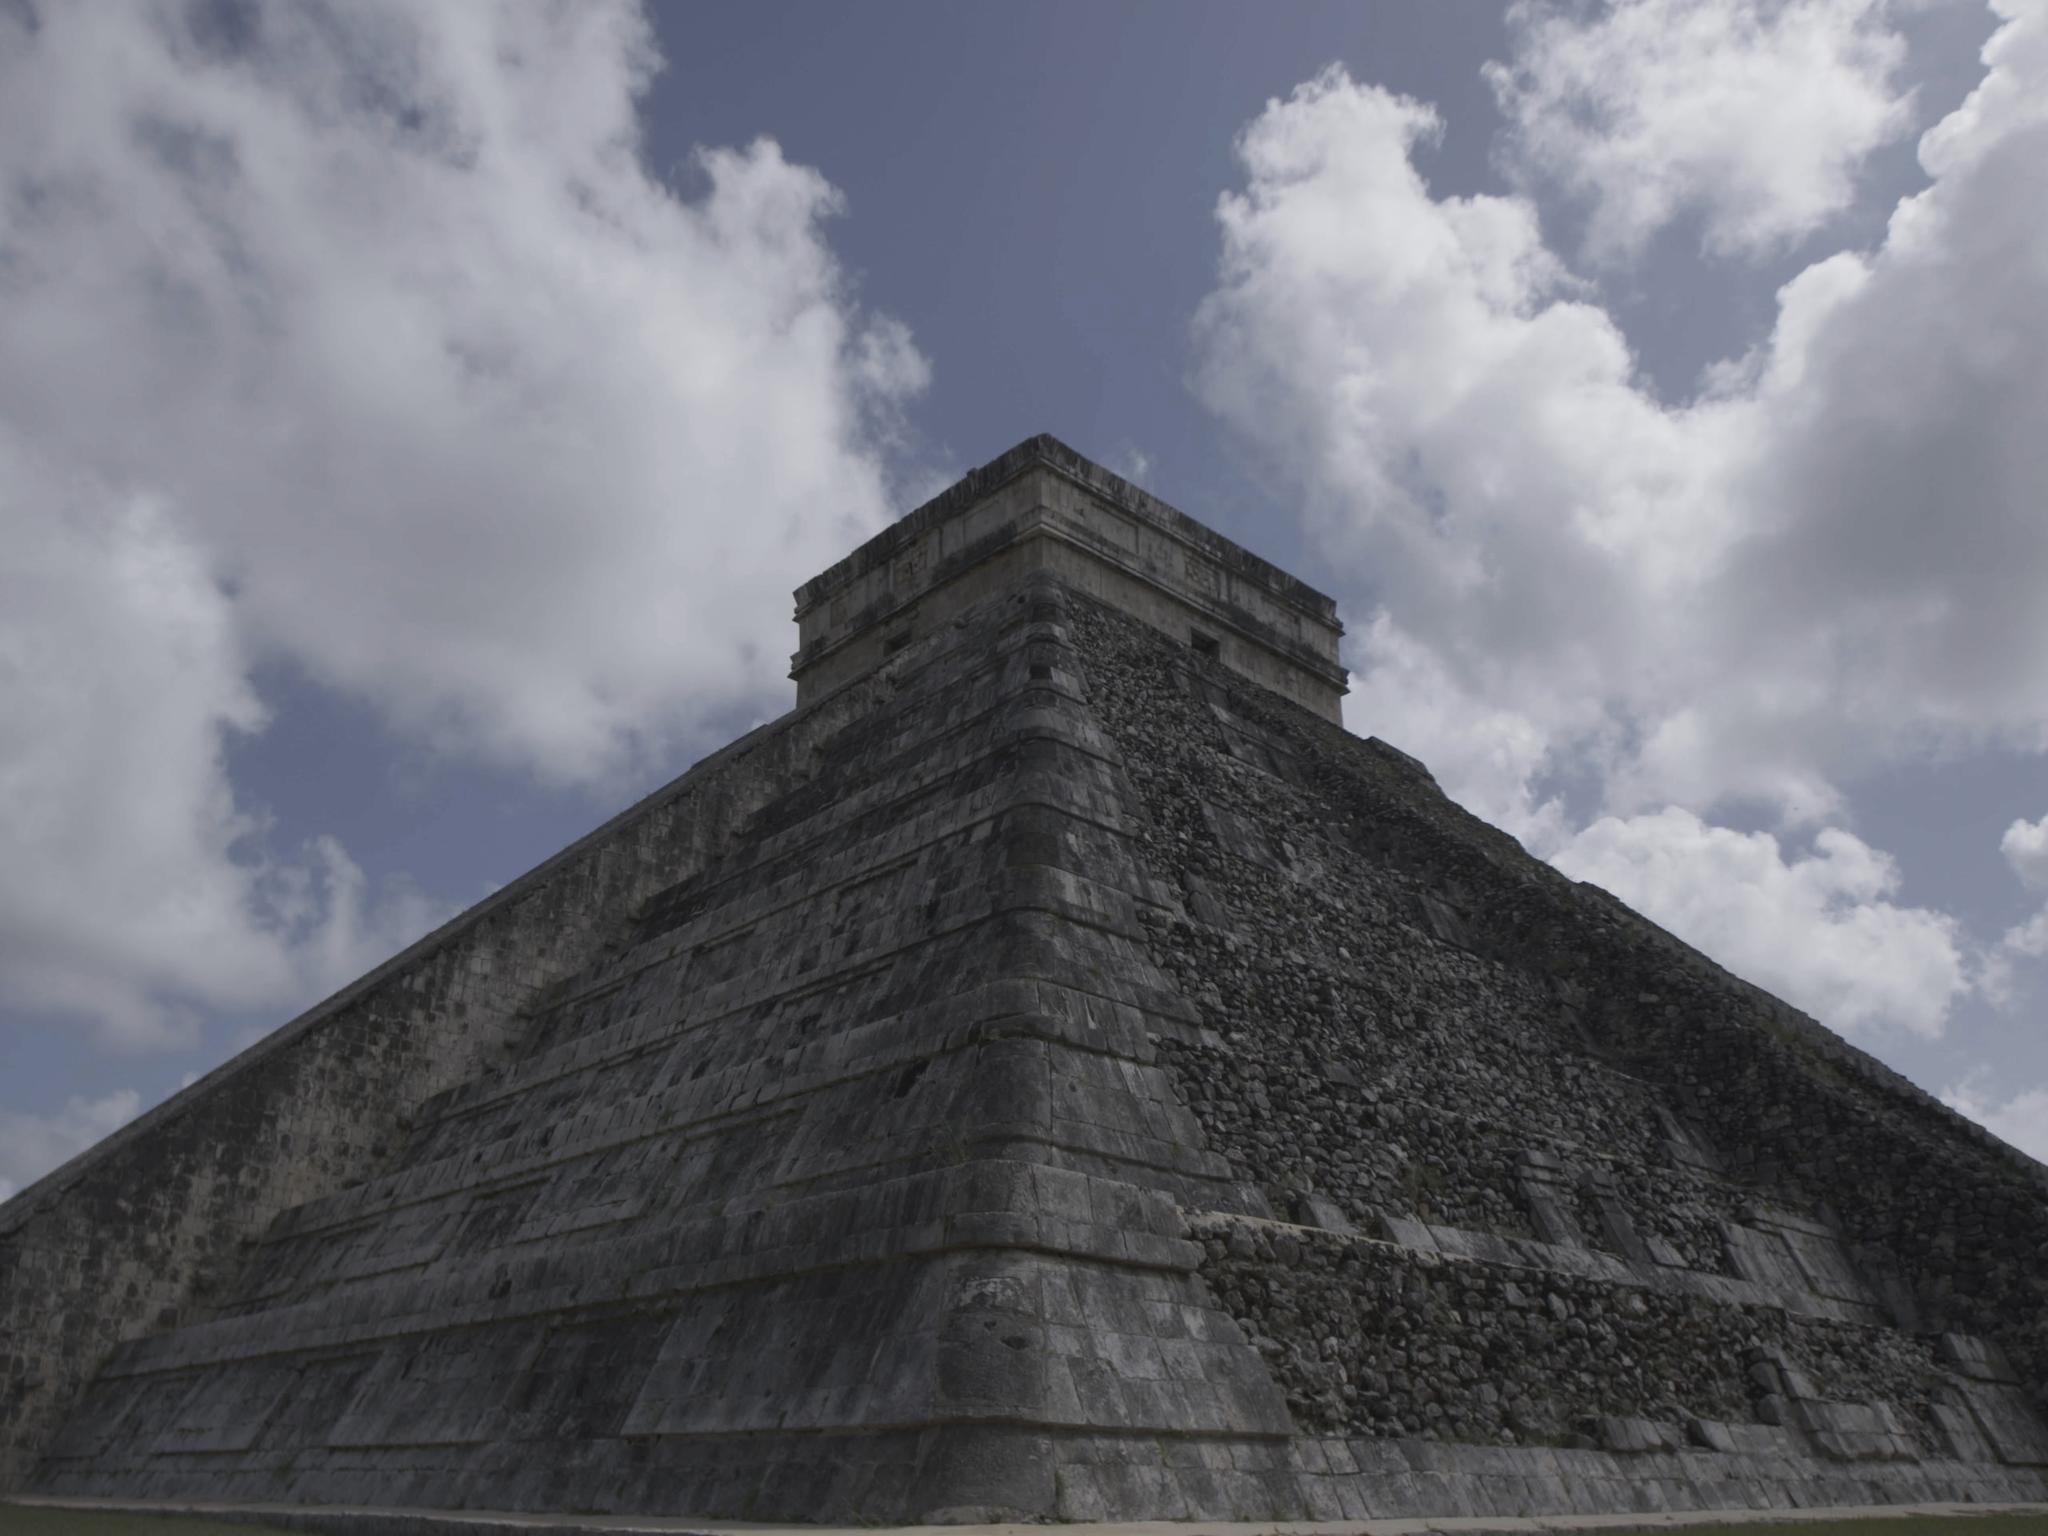 The mysterious Mayan cities: Chichén Itzá